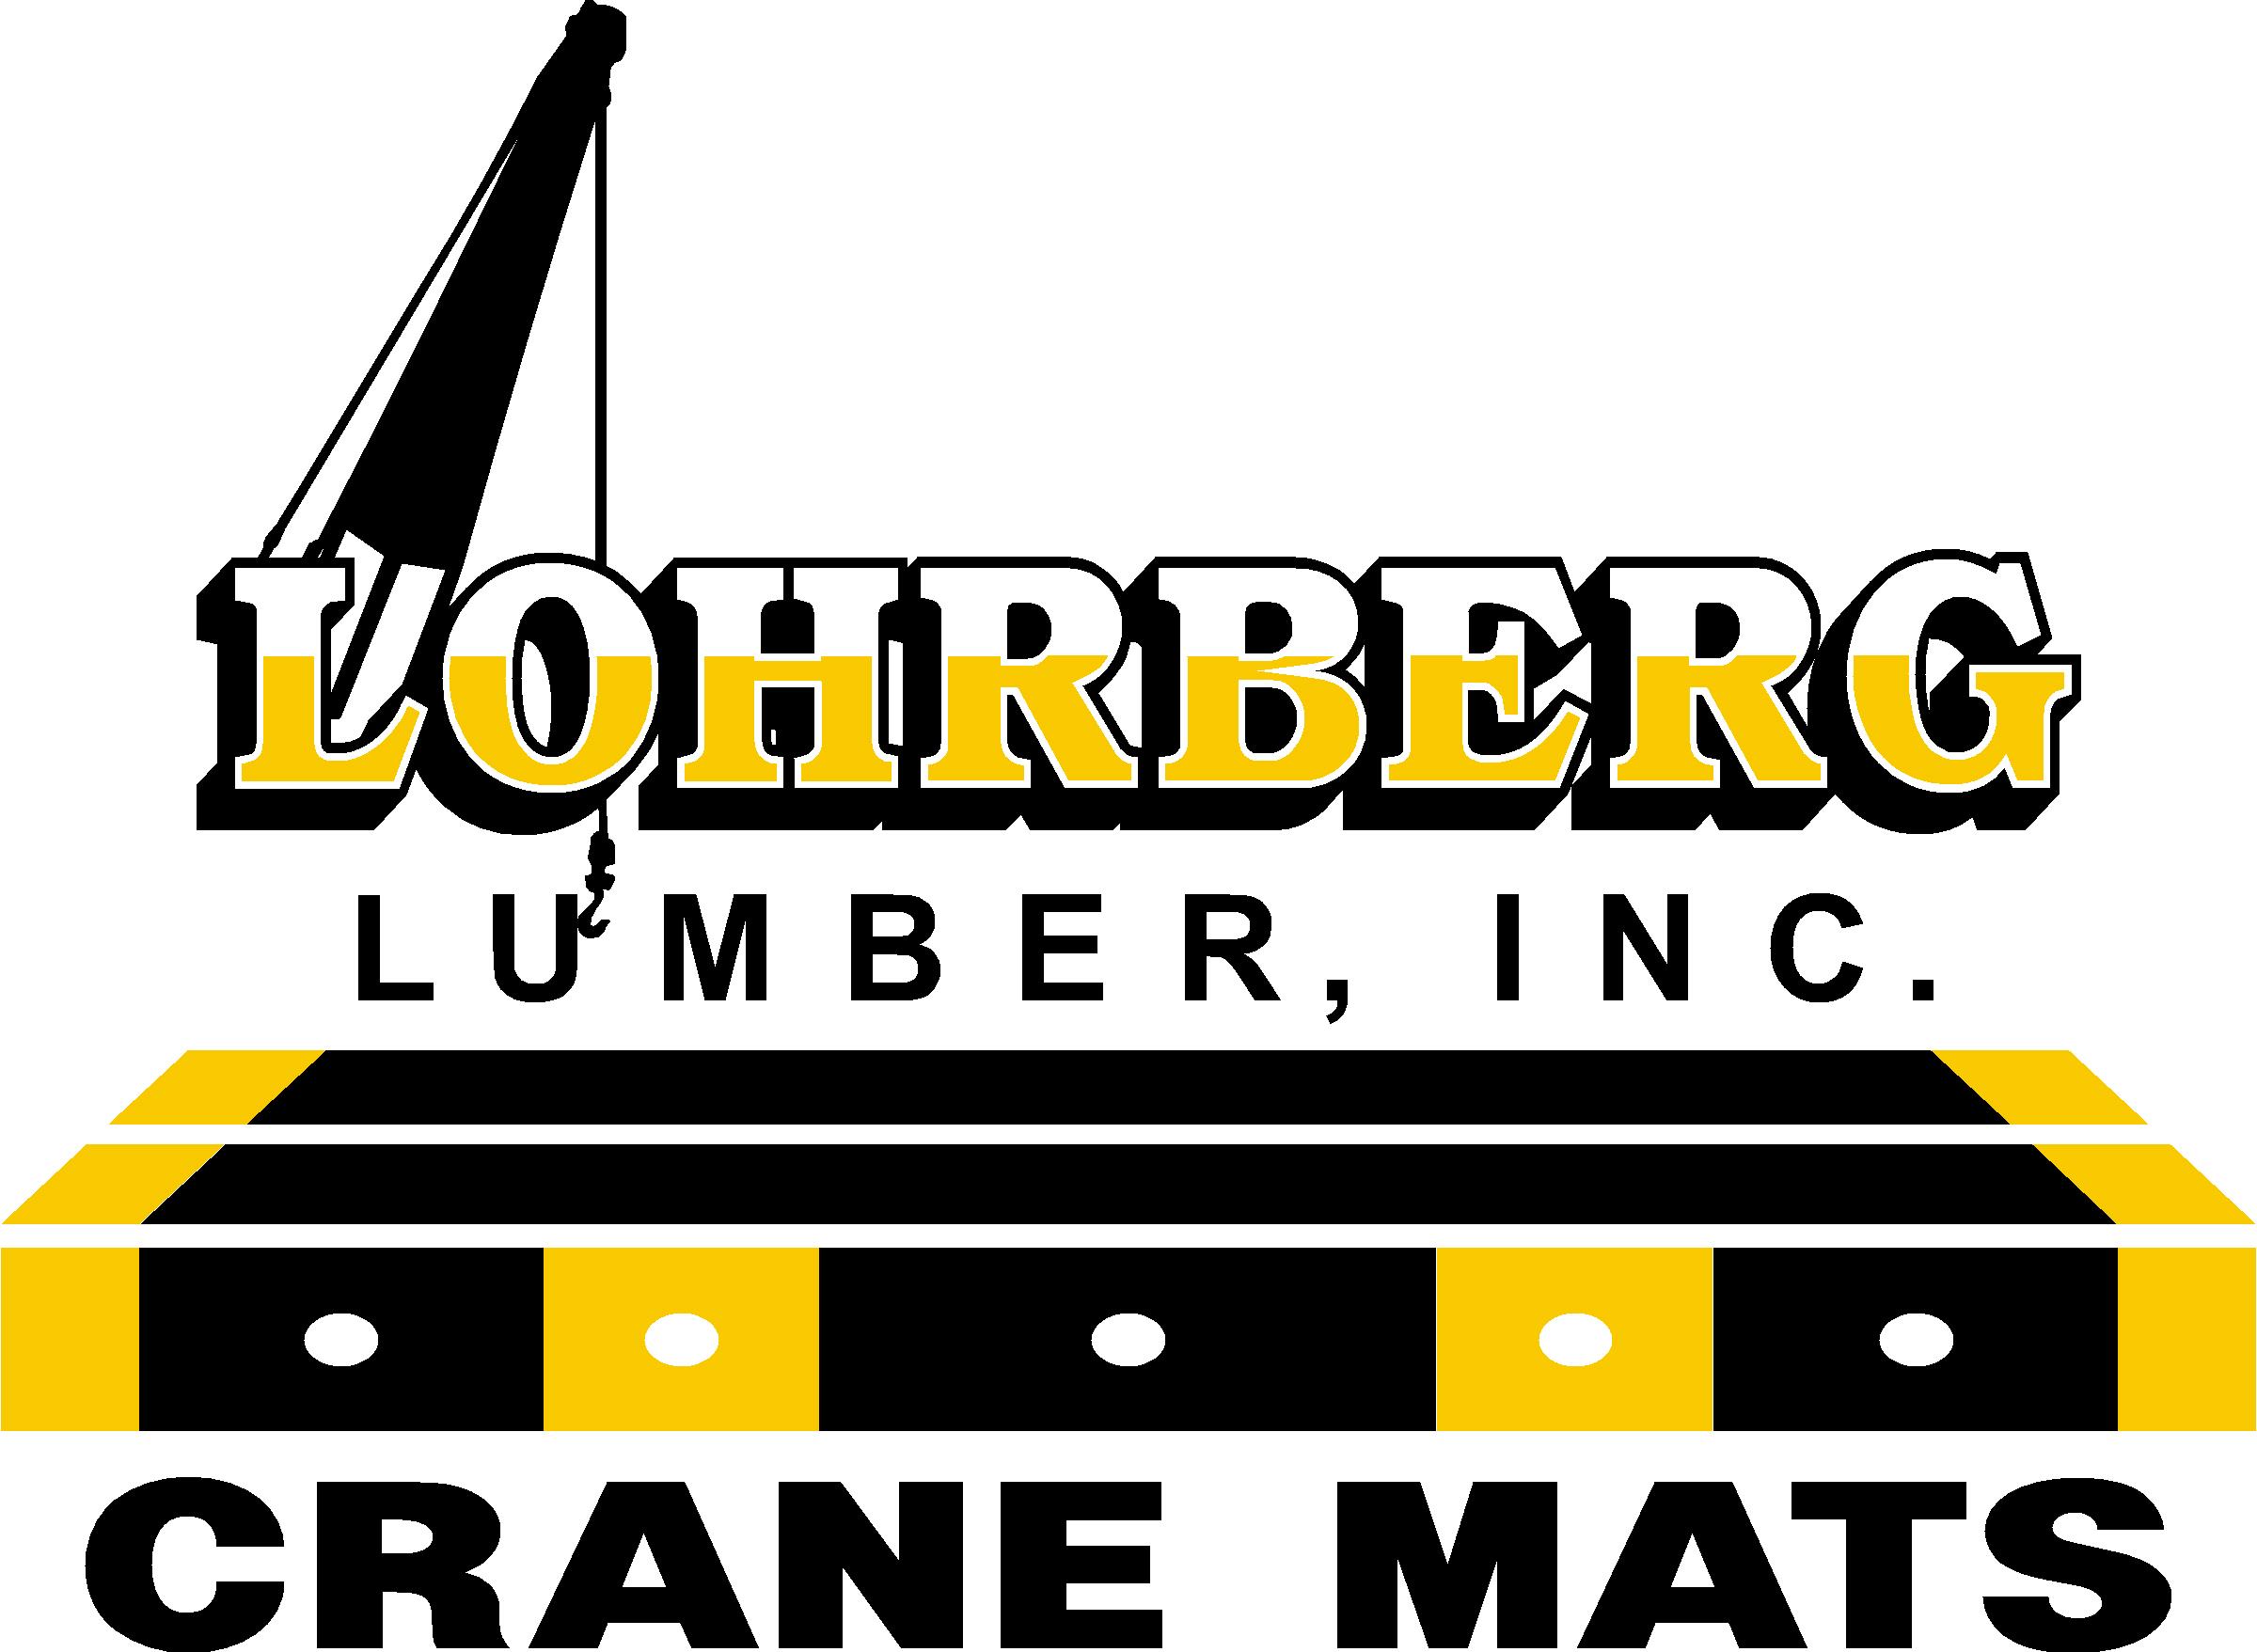 Lohrberg Lumber